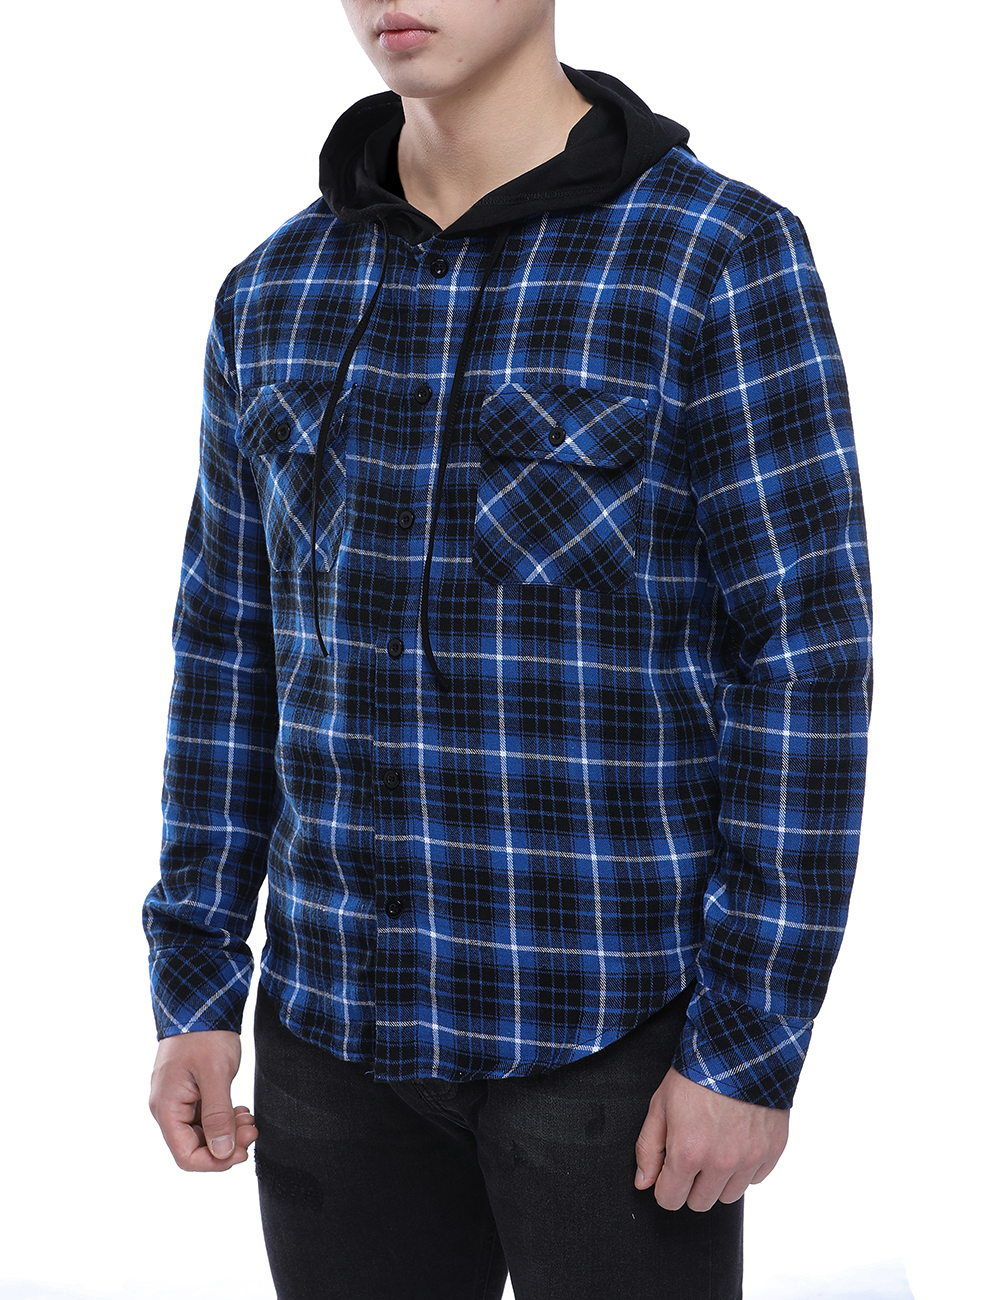 New fashion of shirt 58